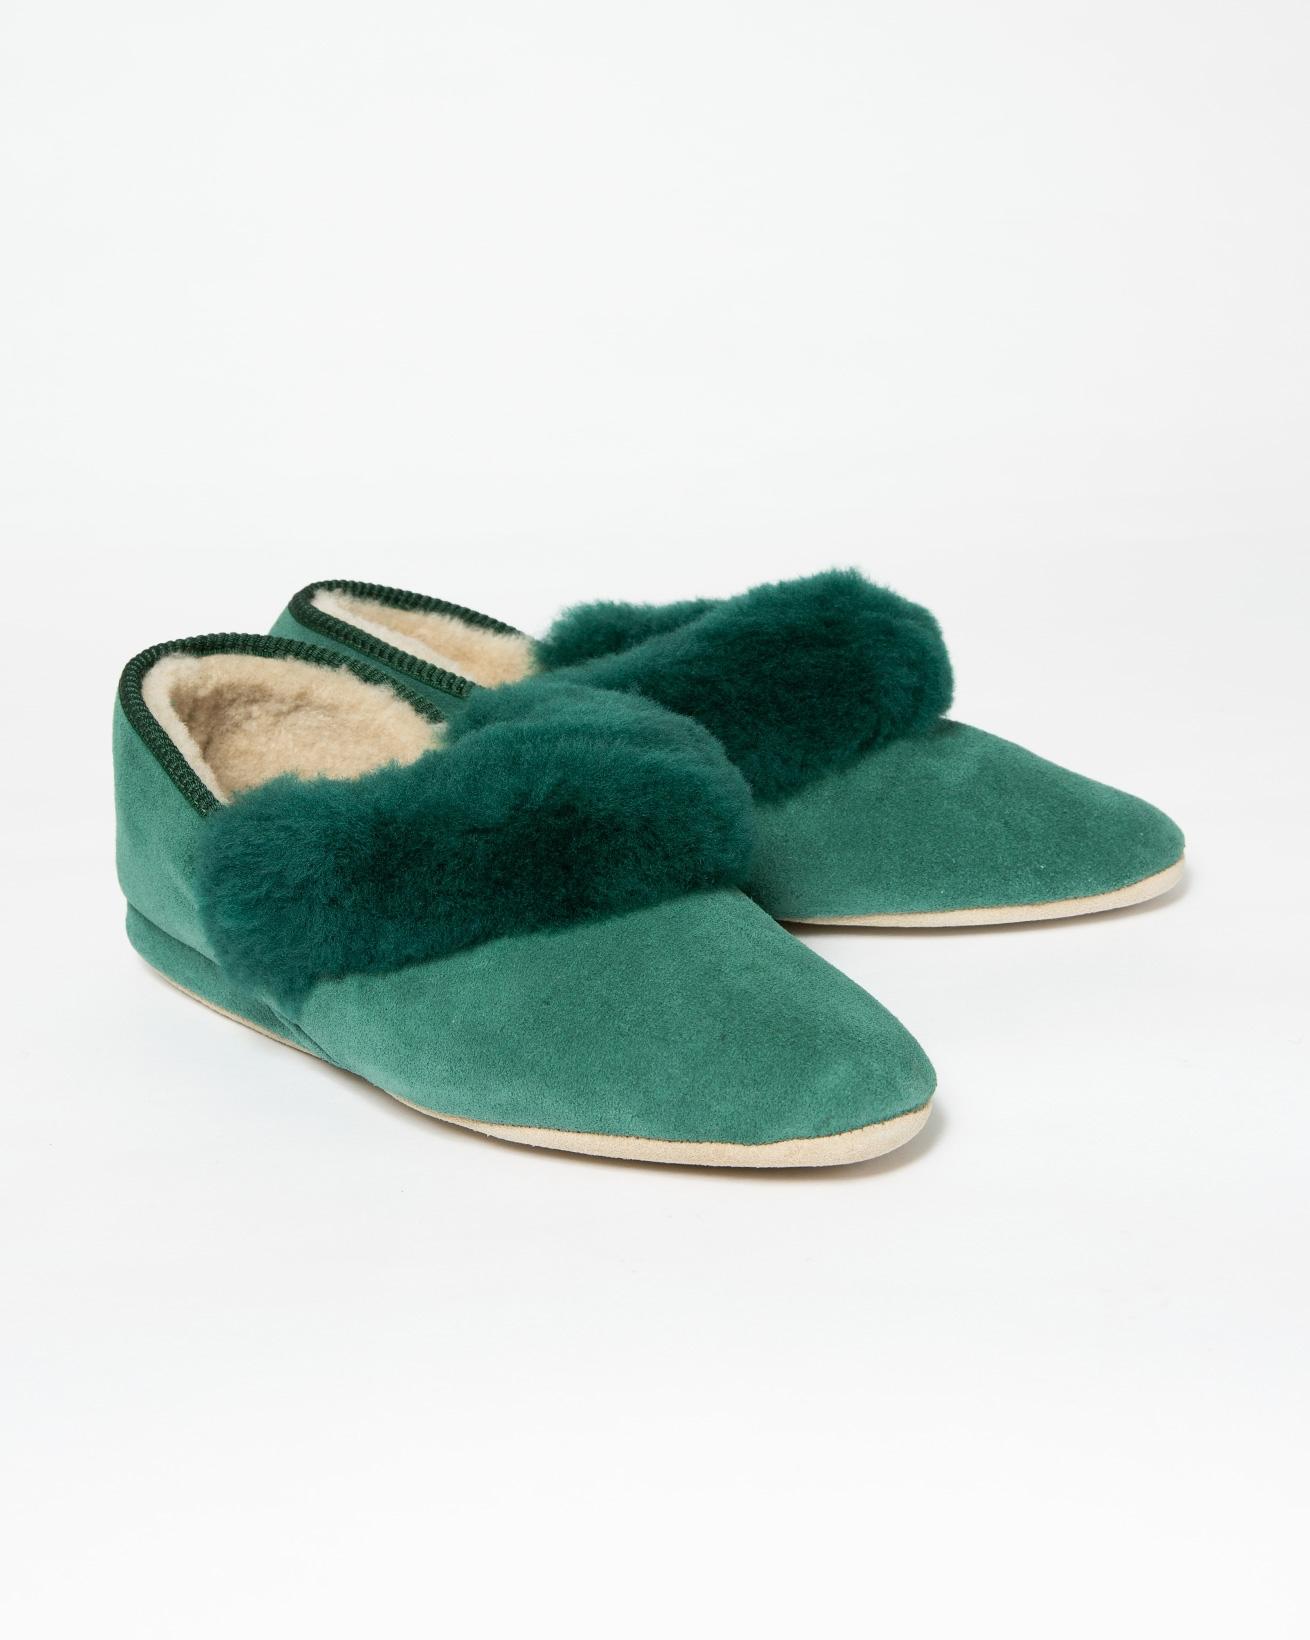 Ladies Strathmore Slipper - Size 8 - Emerald